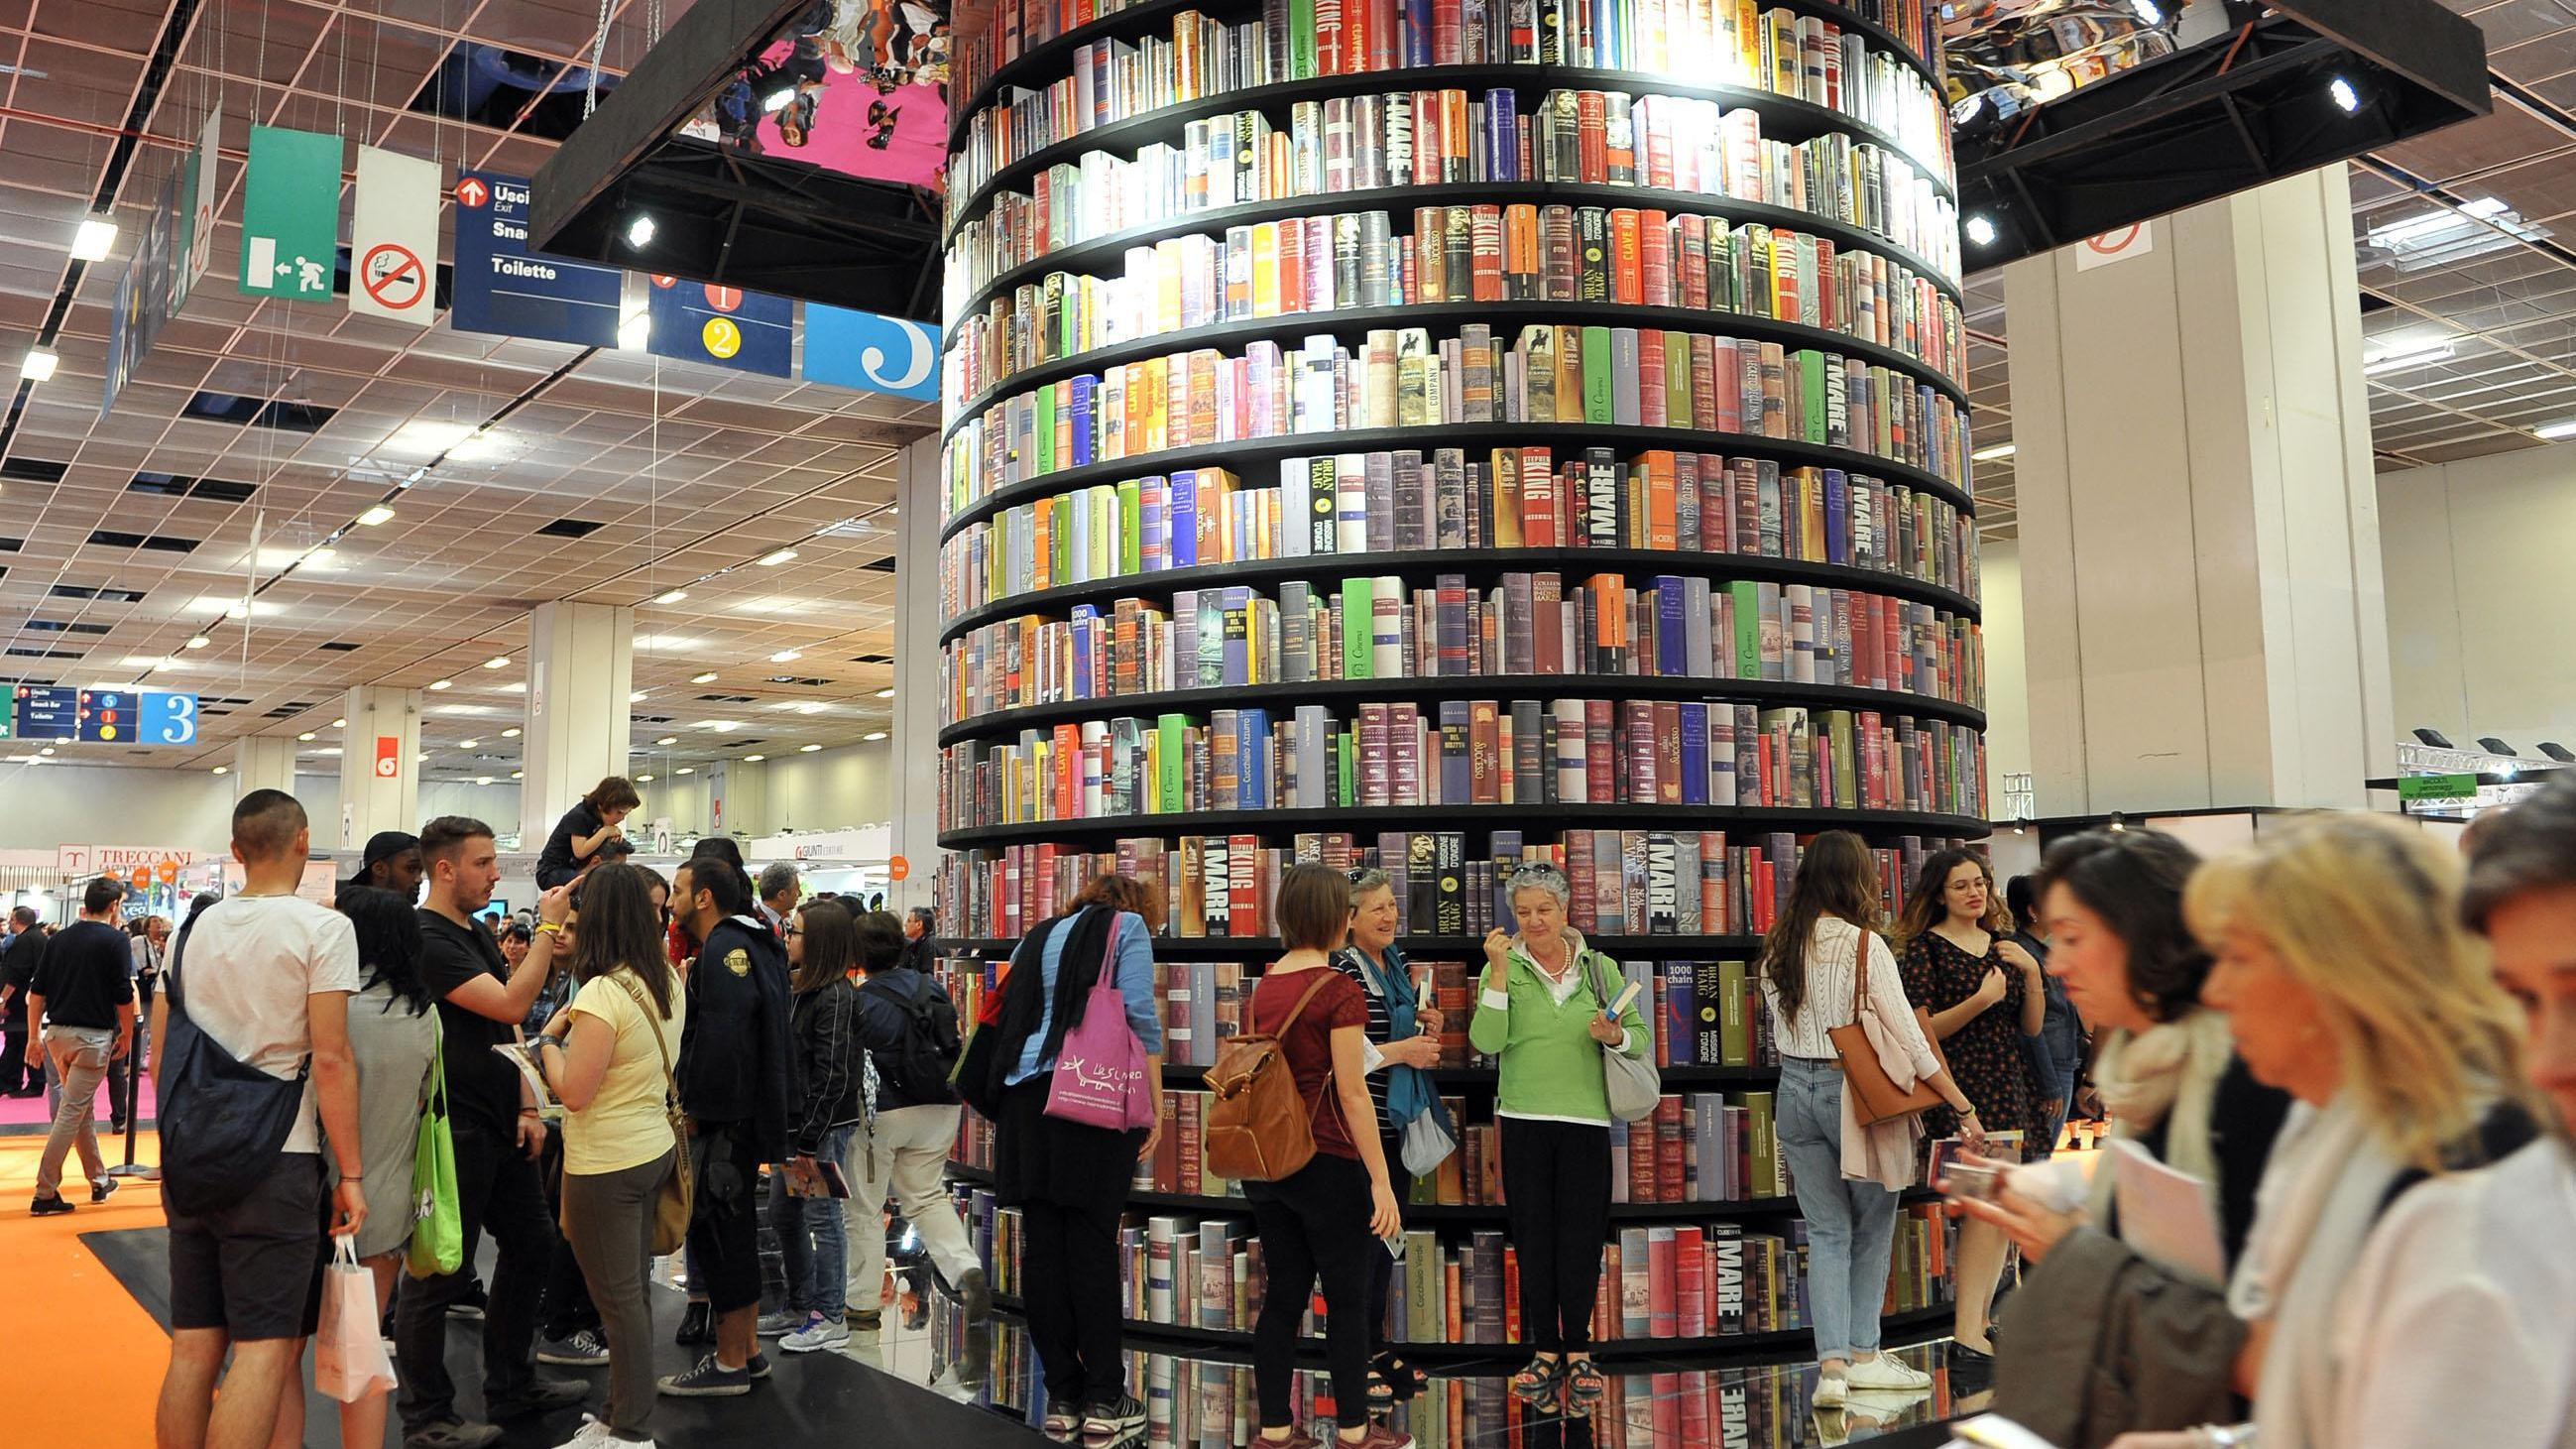 Parigi, macchina Salone Libro è partita